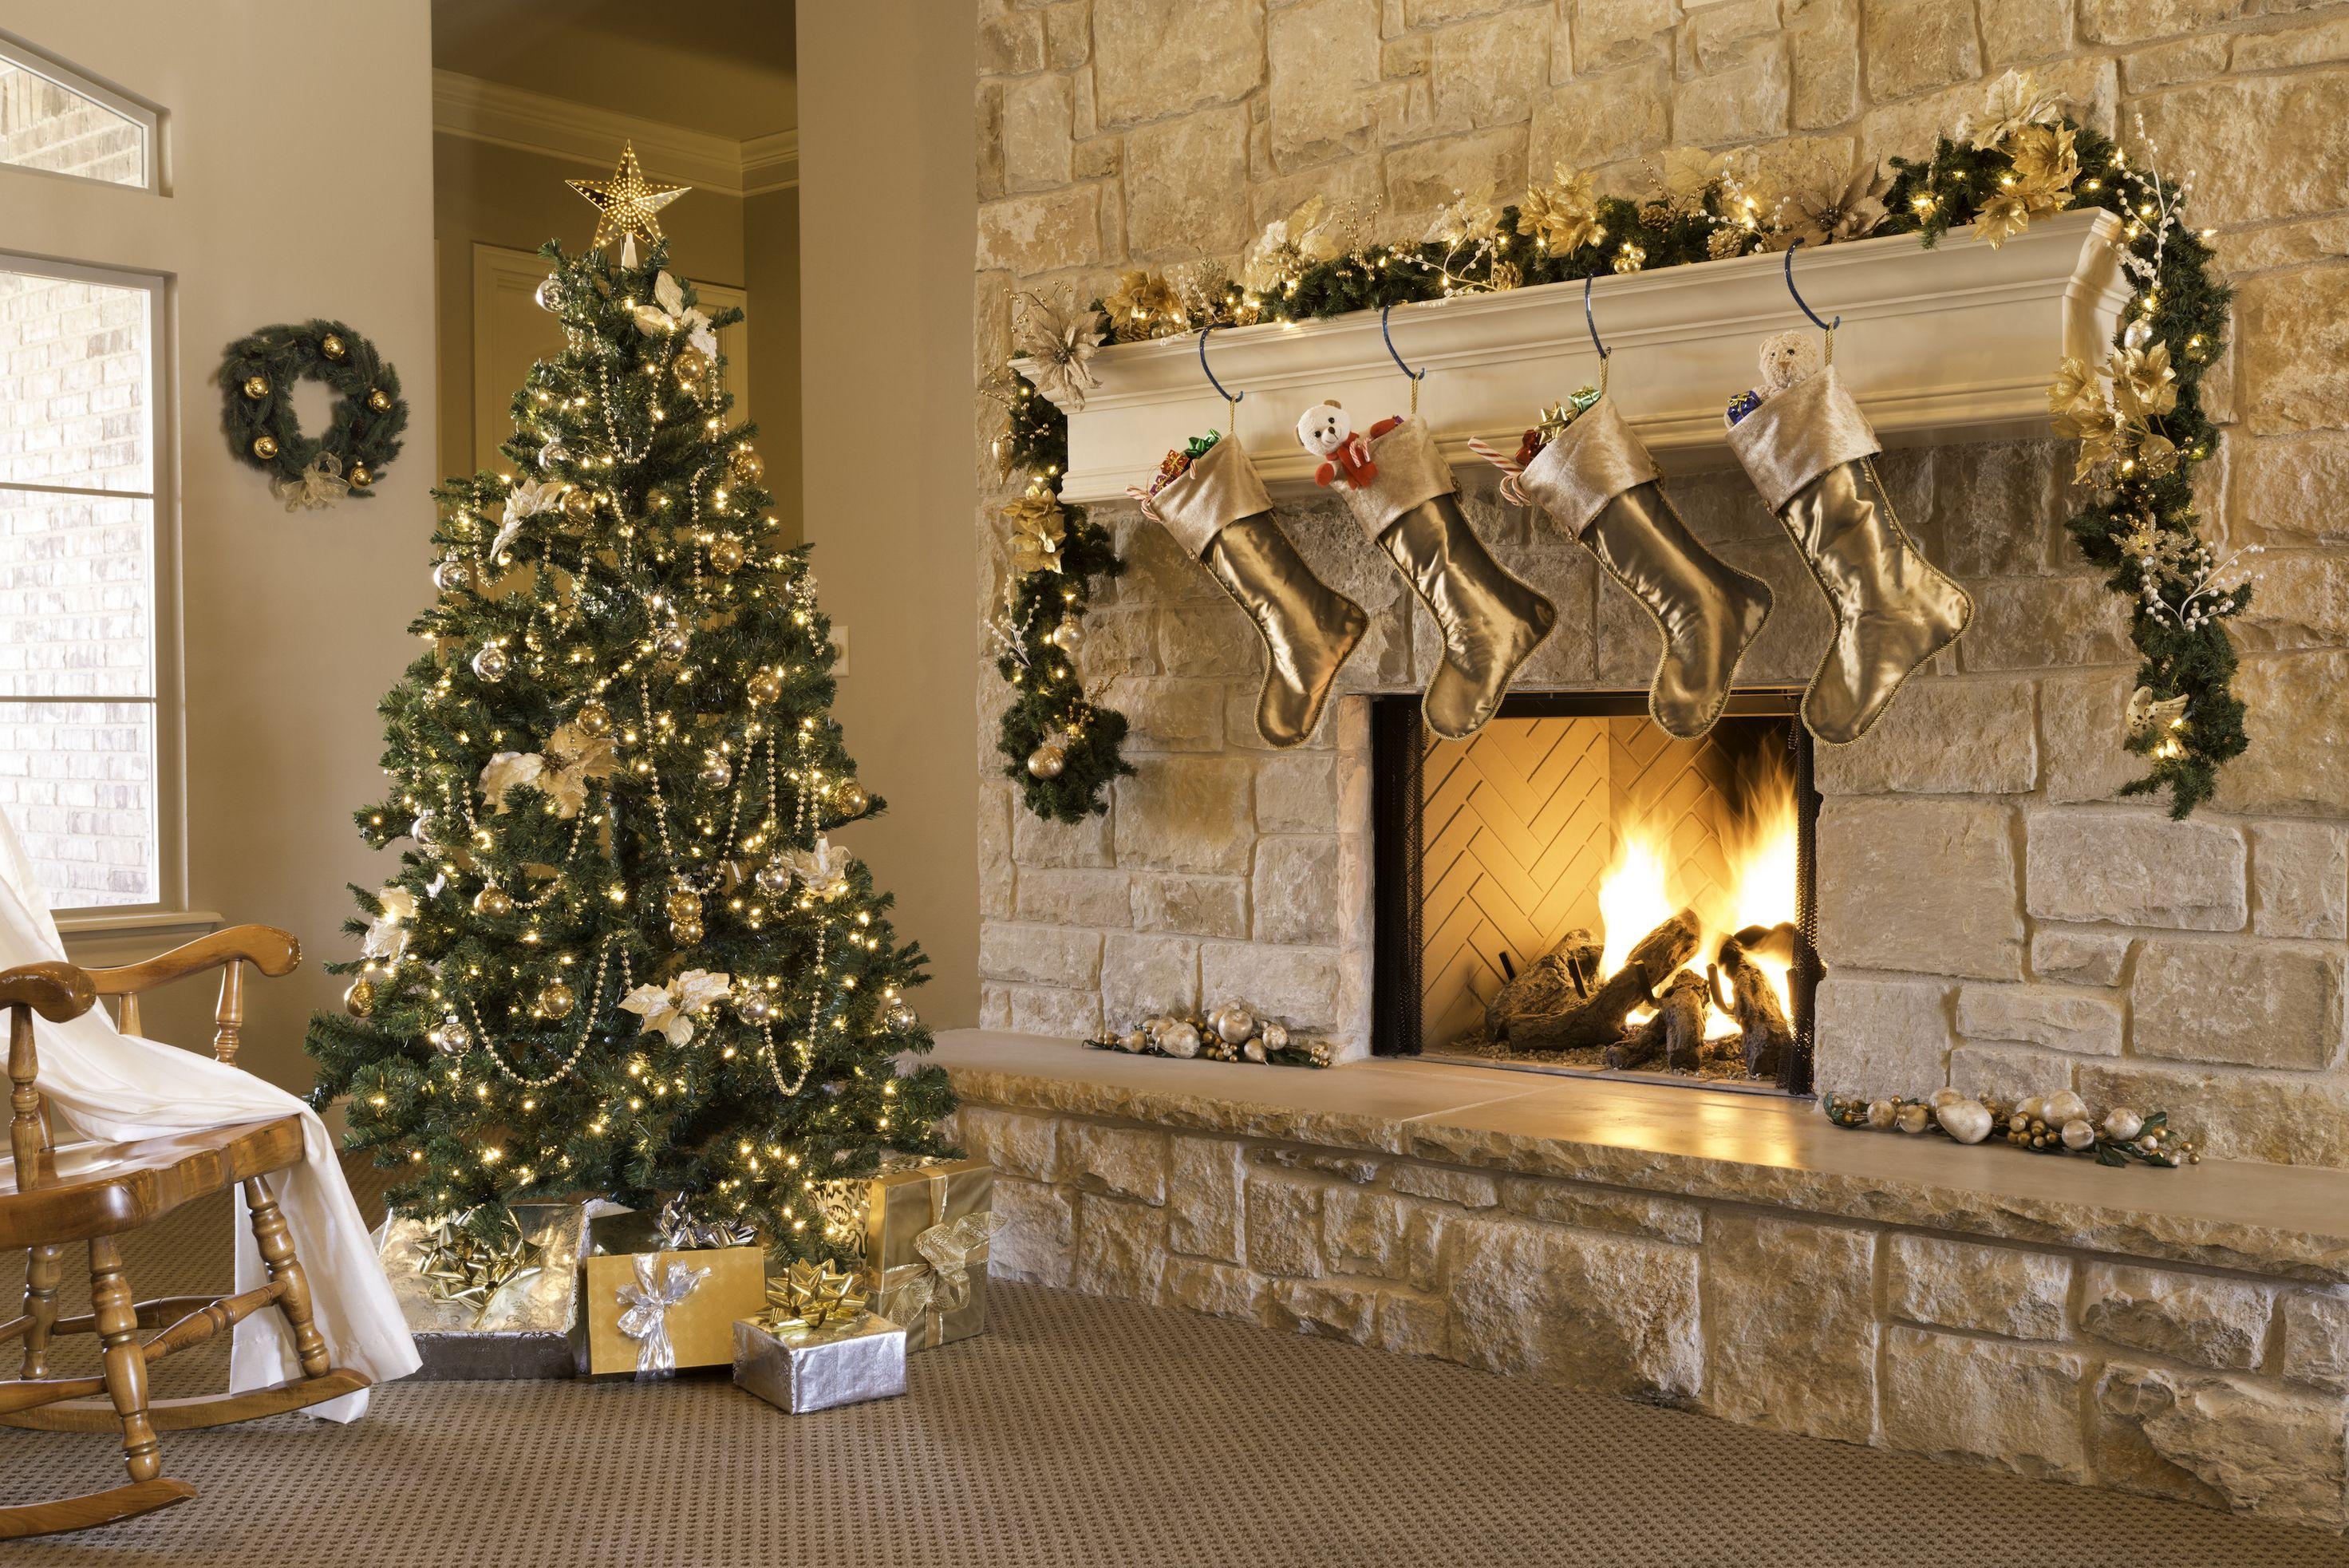 20 elegant christmas garland ideas how to decorate with garland rh elledecor com christmas decoration using garland decorated christmas garlands with lights